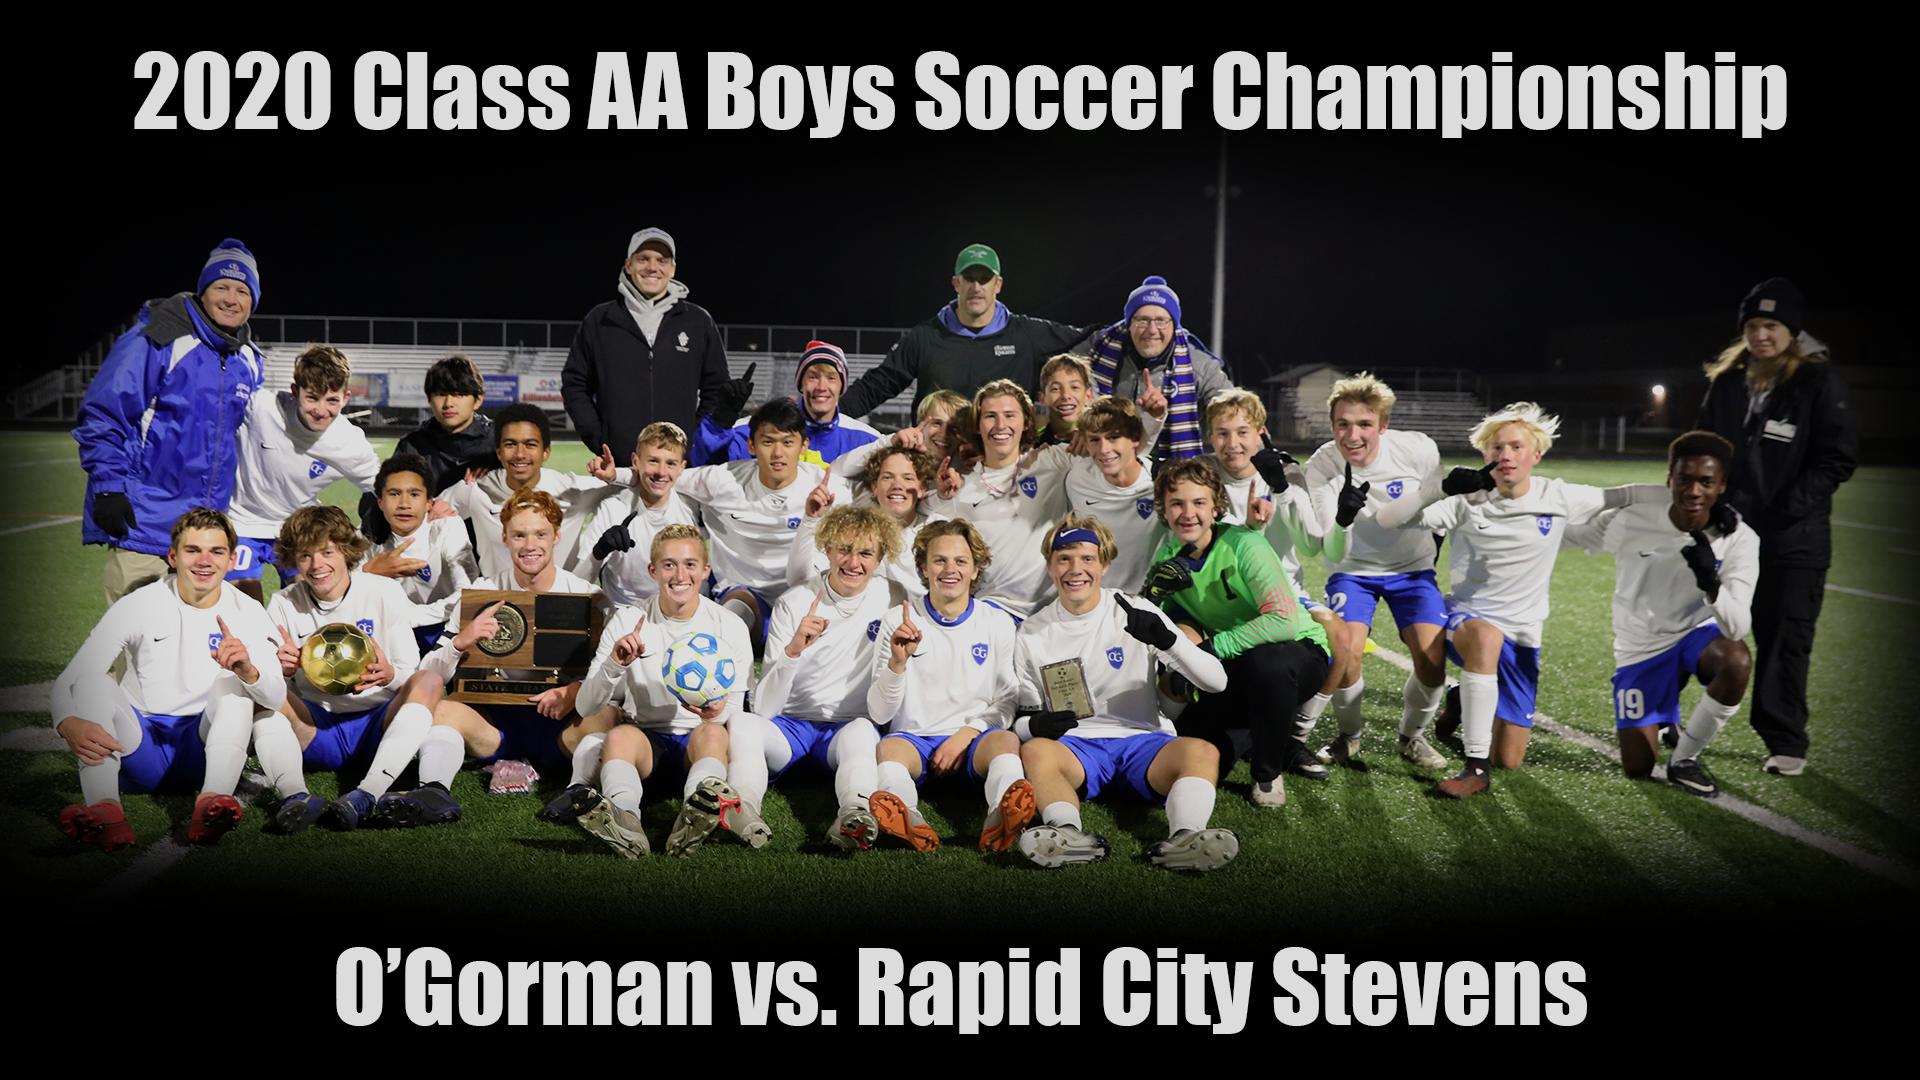 2020 Class AA Boys Soccer Championship